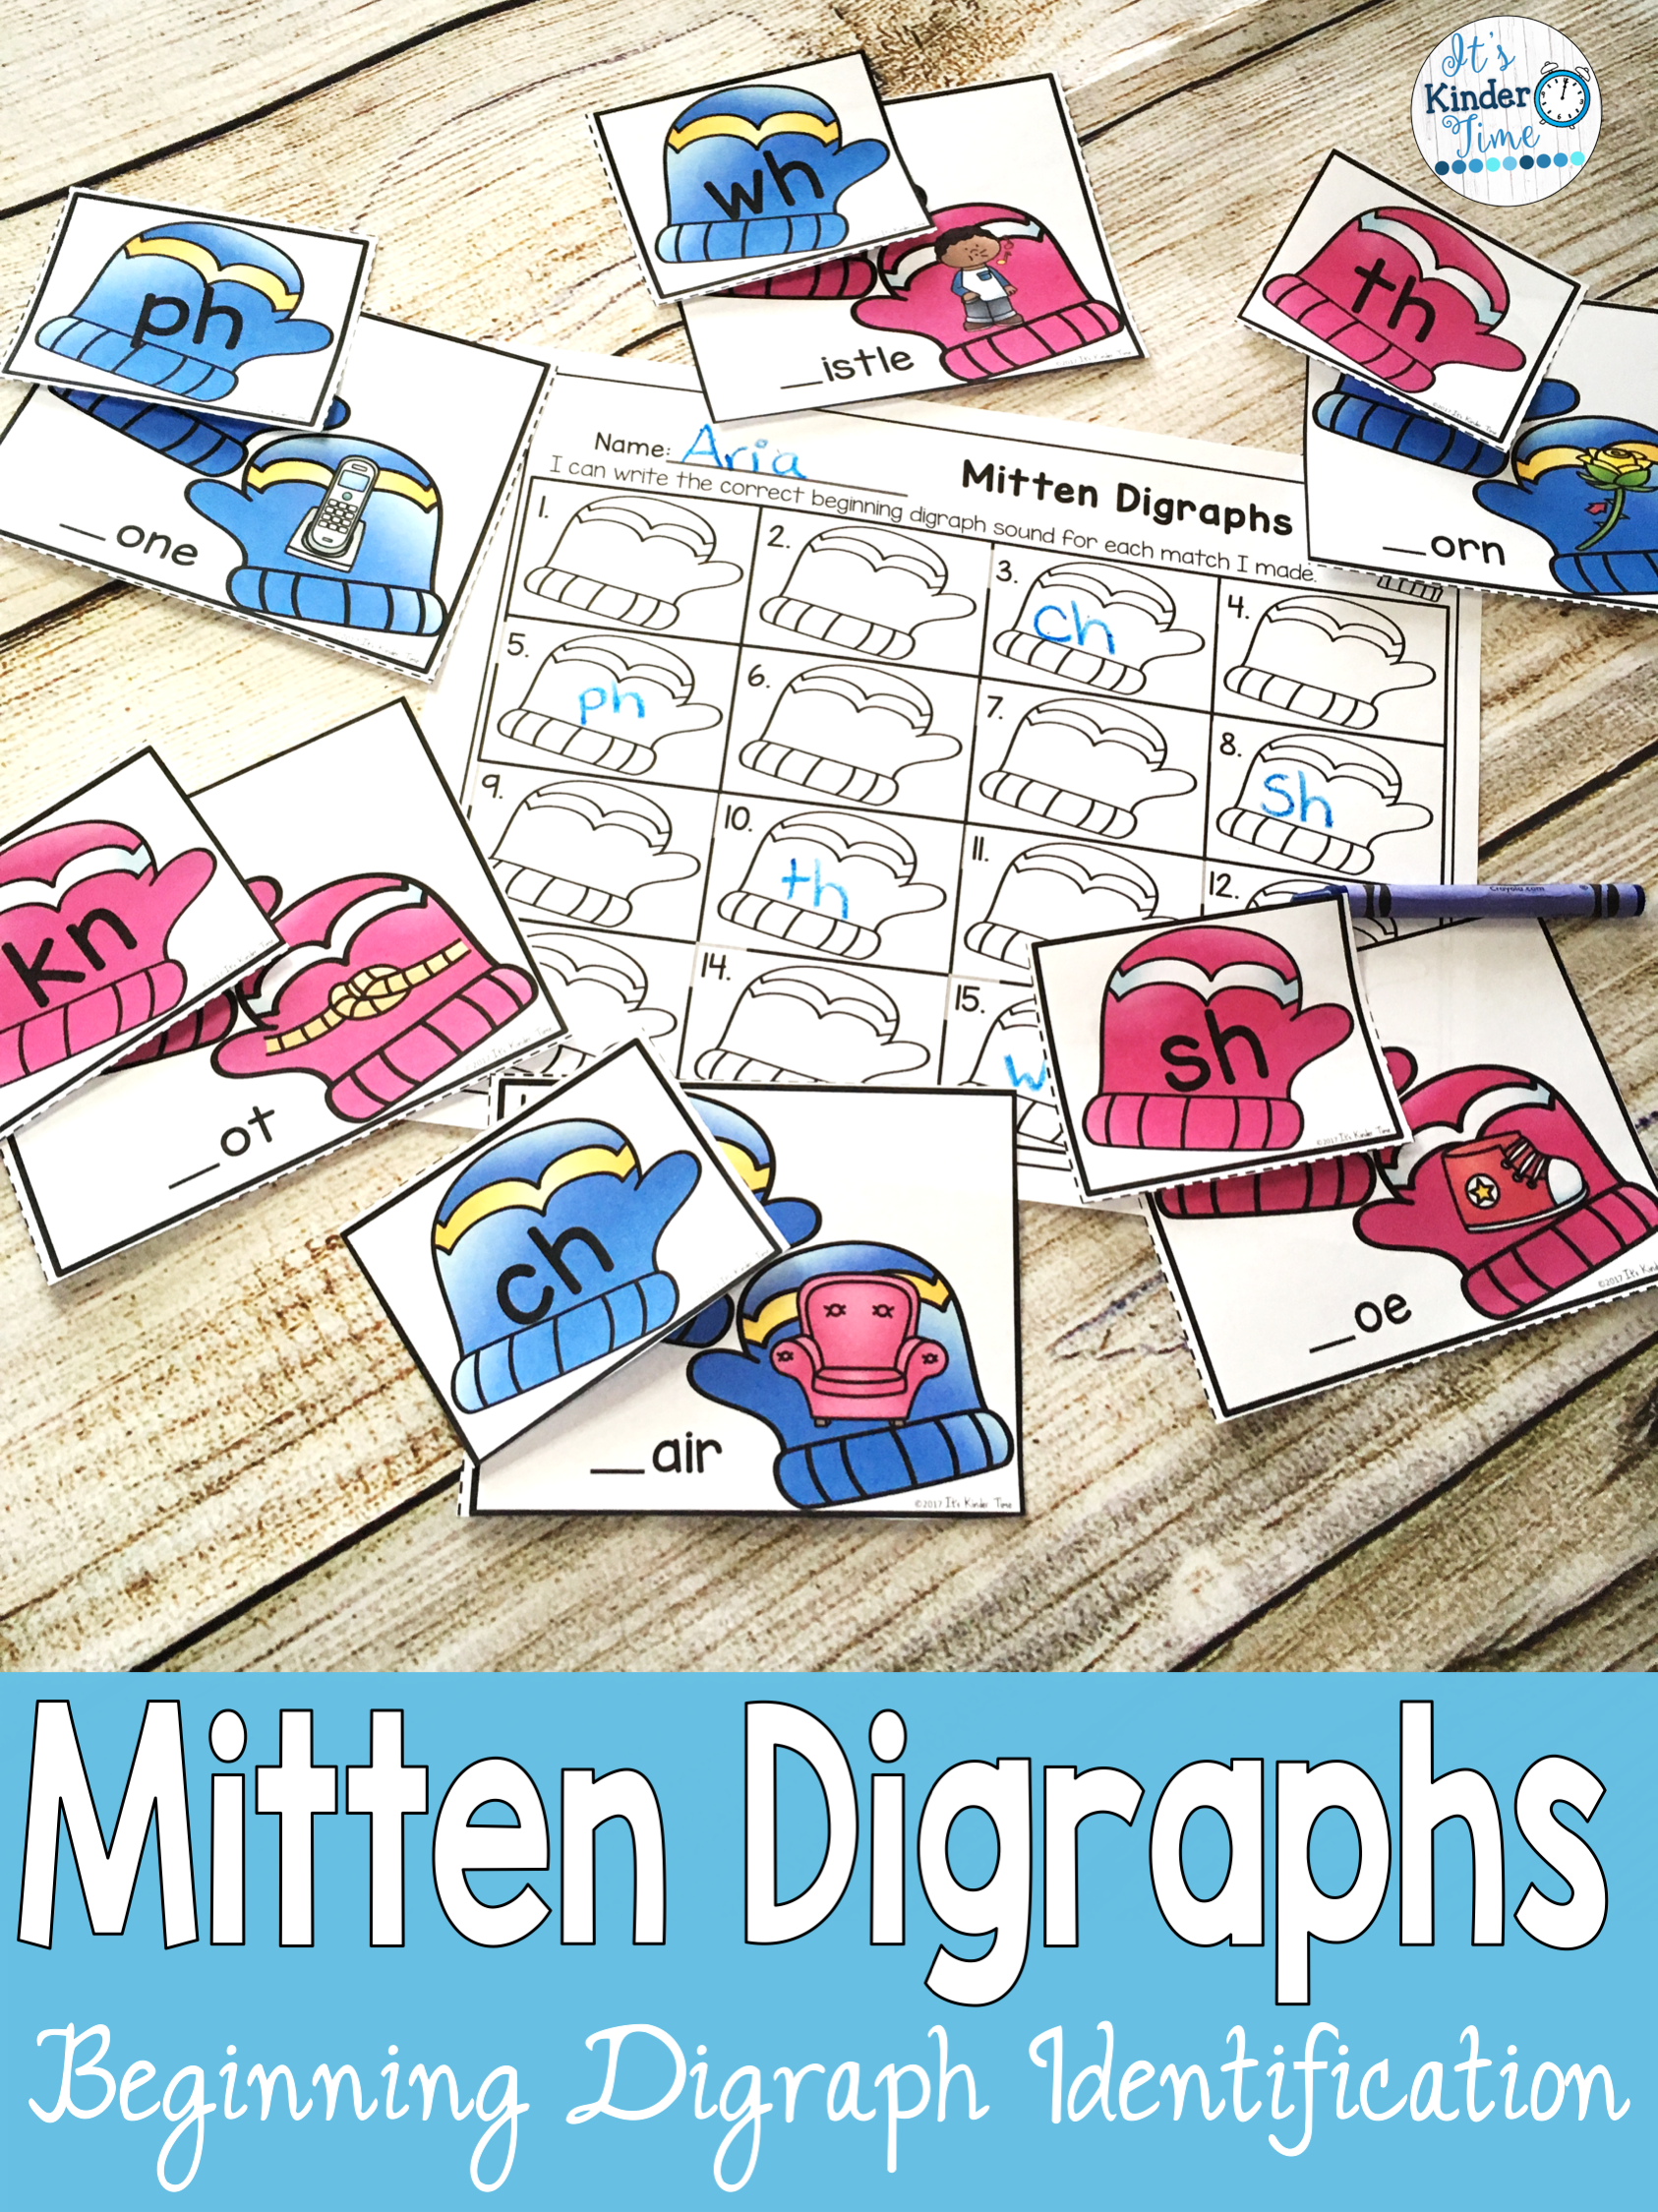 Mitten Digraphs